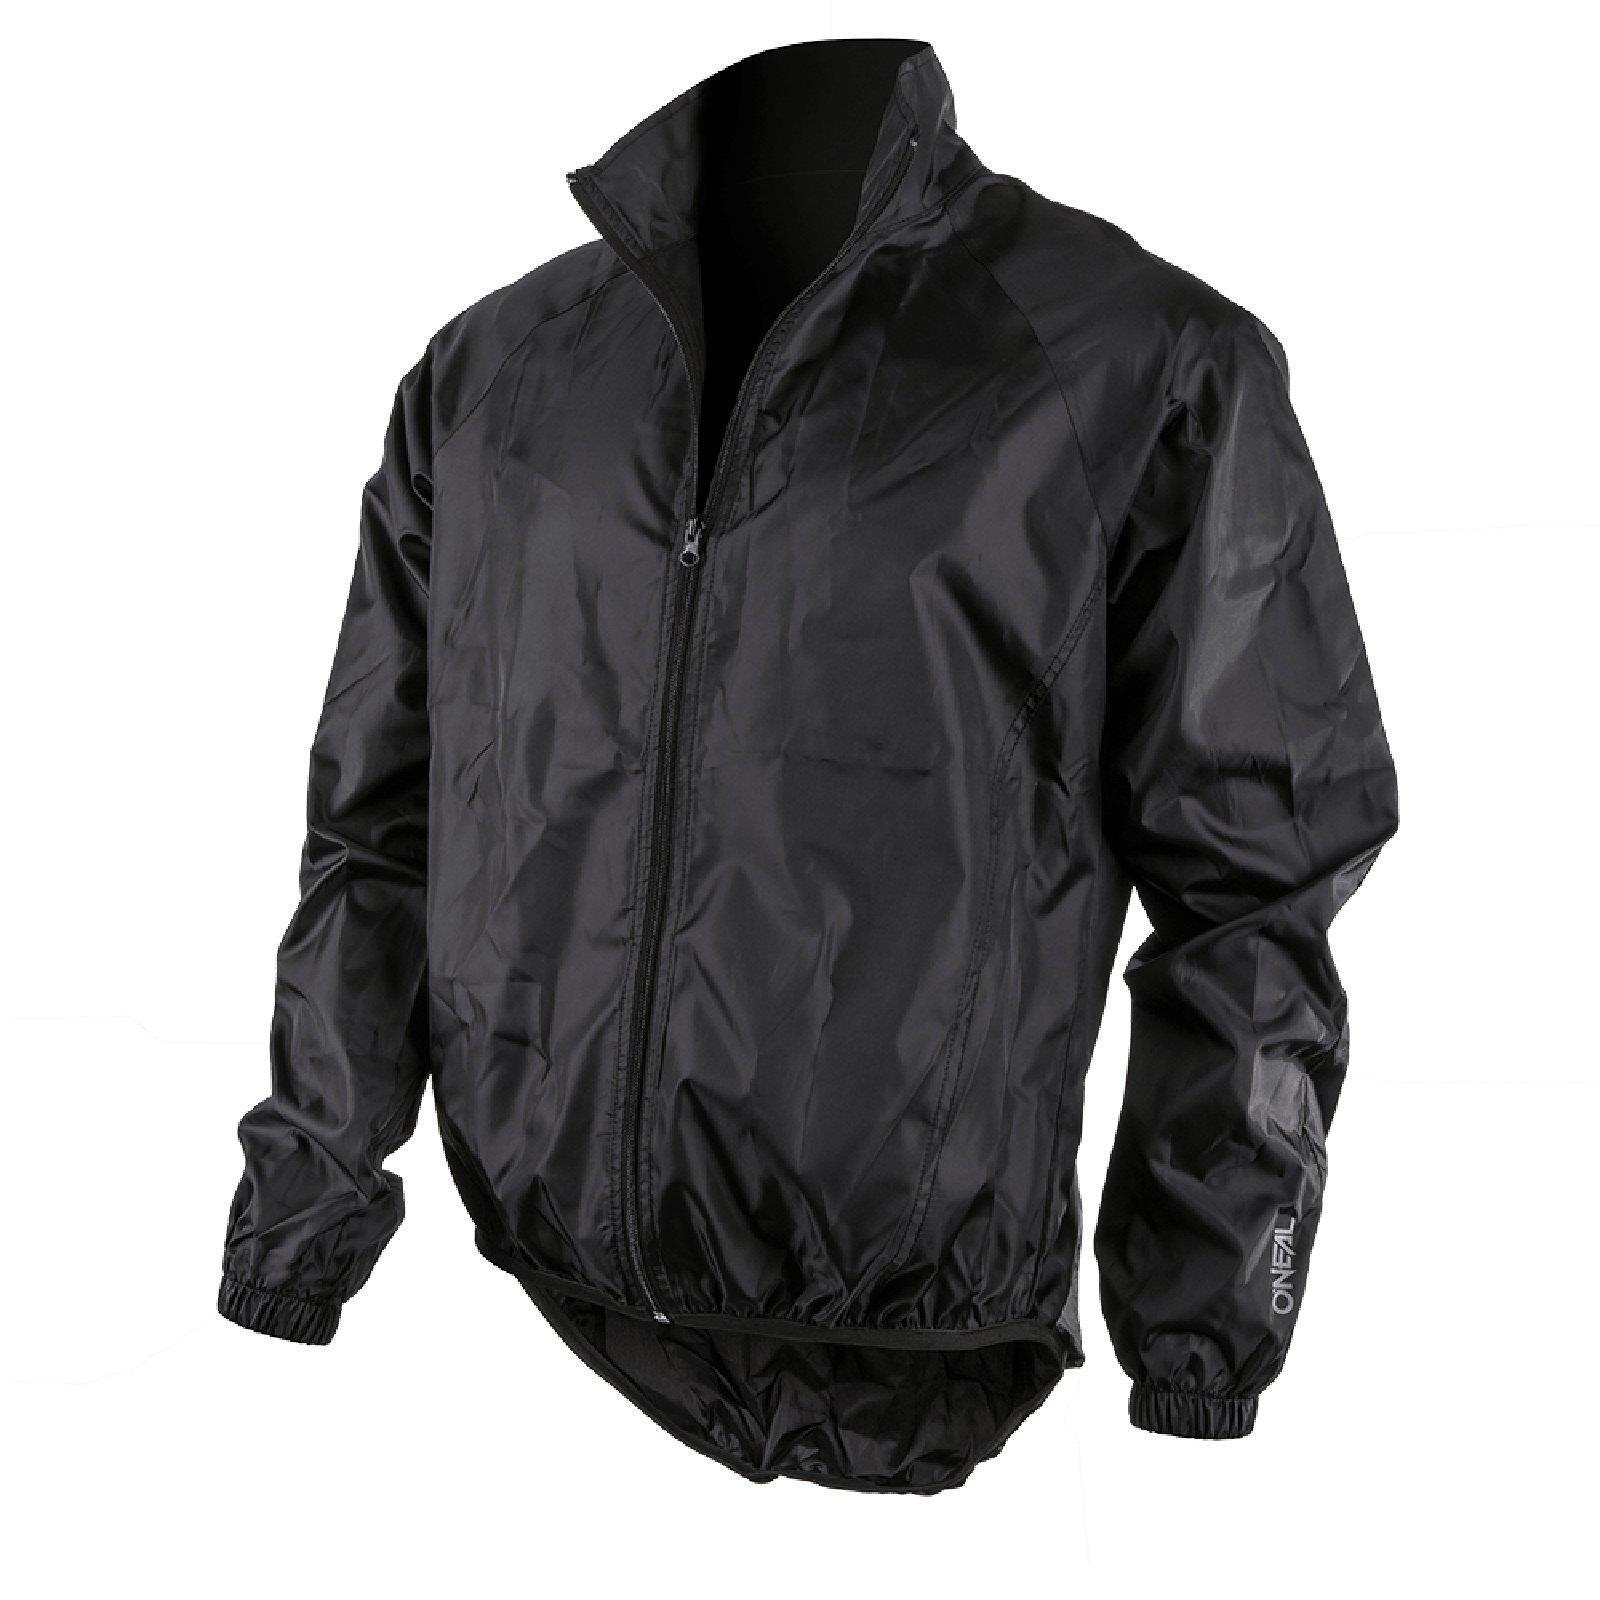 ONeal brisa lluvia chaqueta  transpirable negro Mountain bike Moto MX cross MTB  mejor opcion